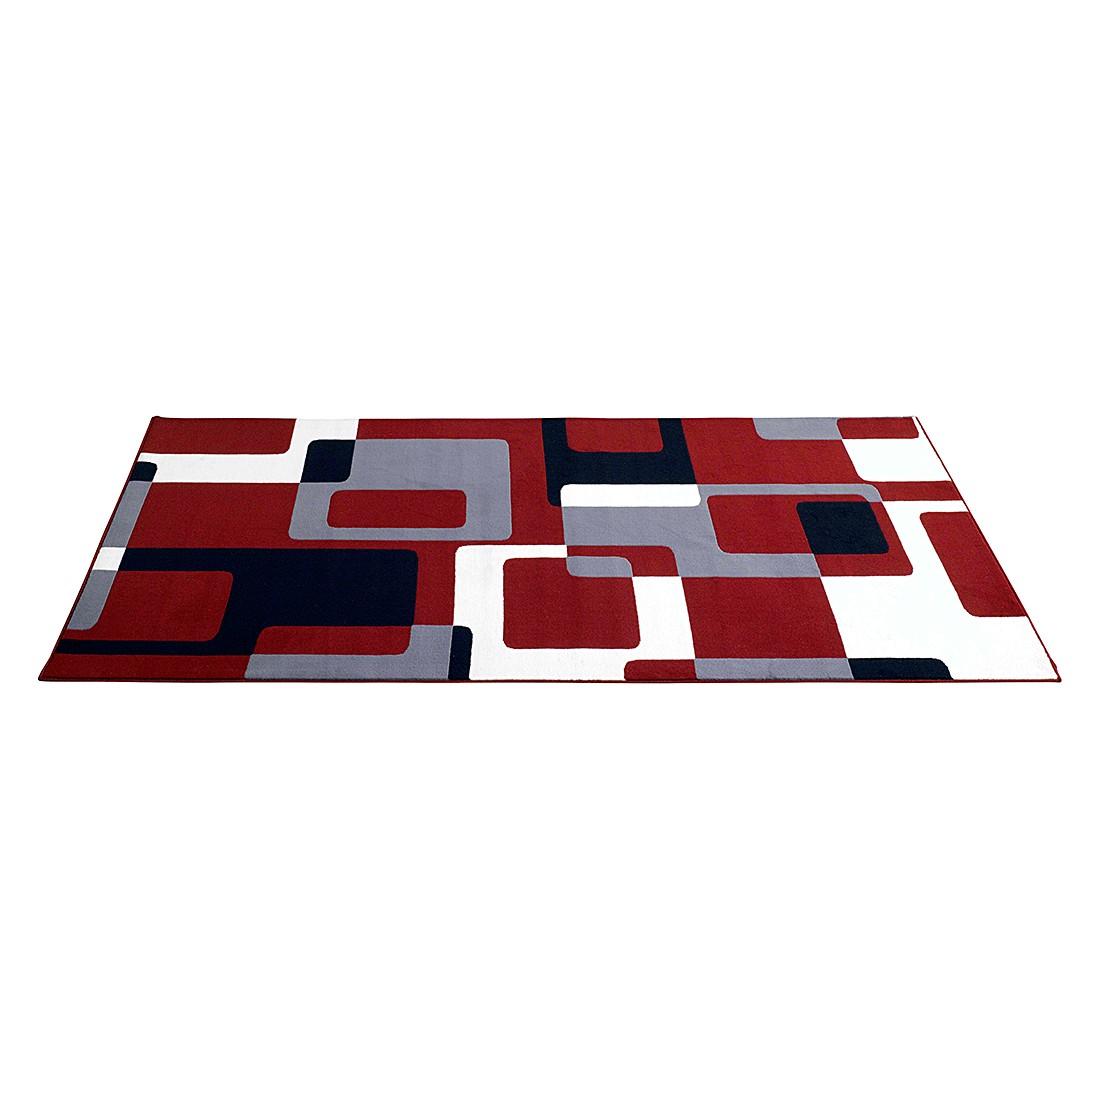 Tapijt Retro - 80x150cm - Rood/zwart/grijs, Hanse Home Collection